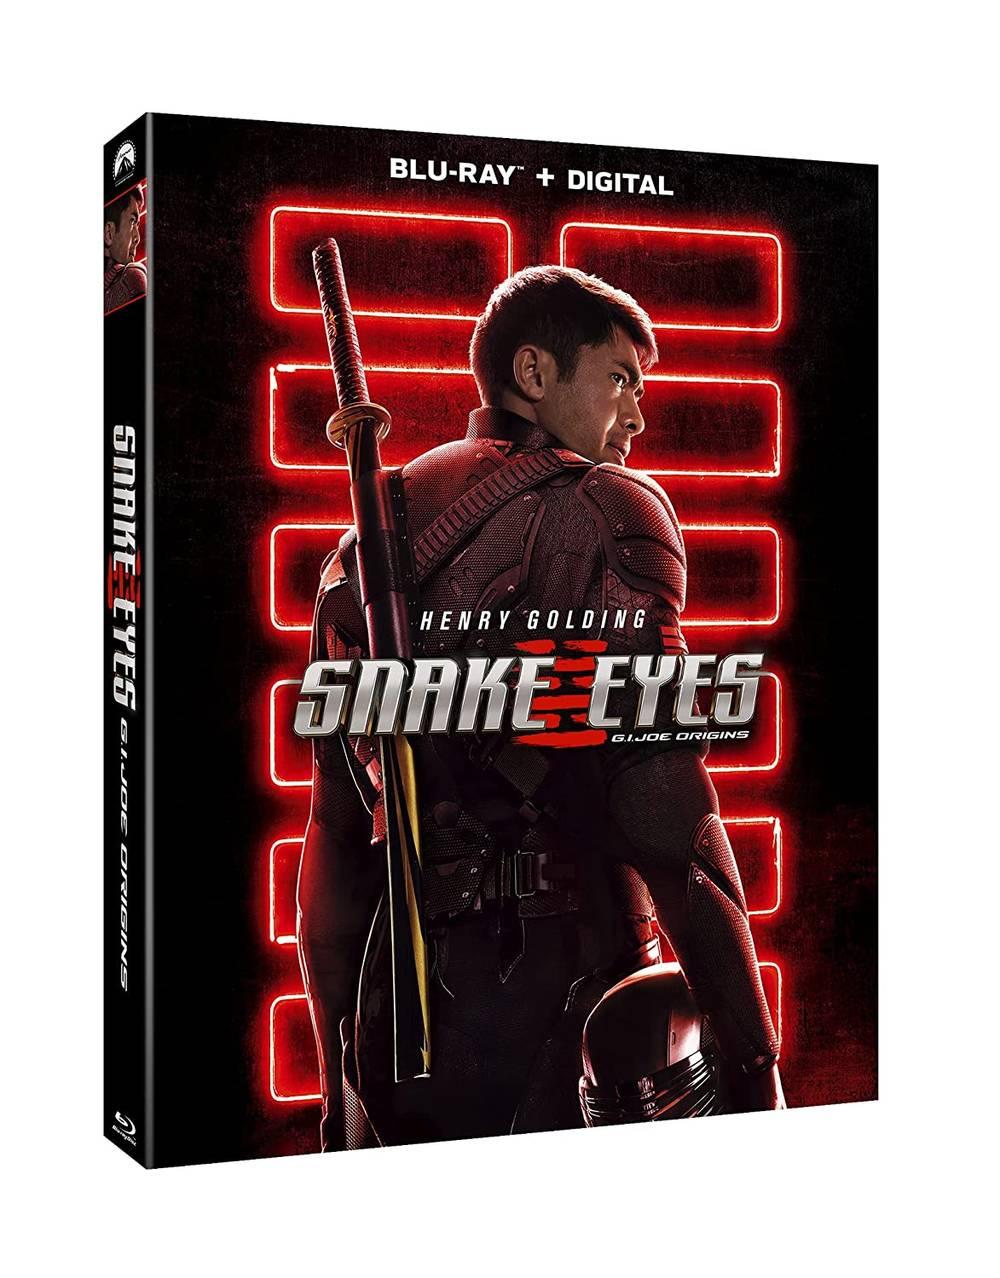 G.I. Joe - Snake Eyes: G.I. Joe Origins